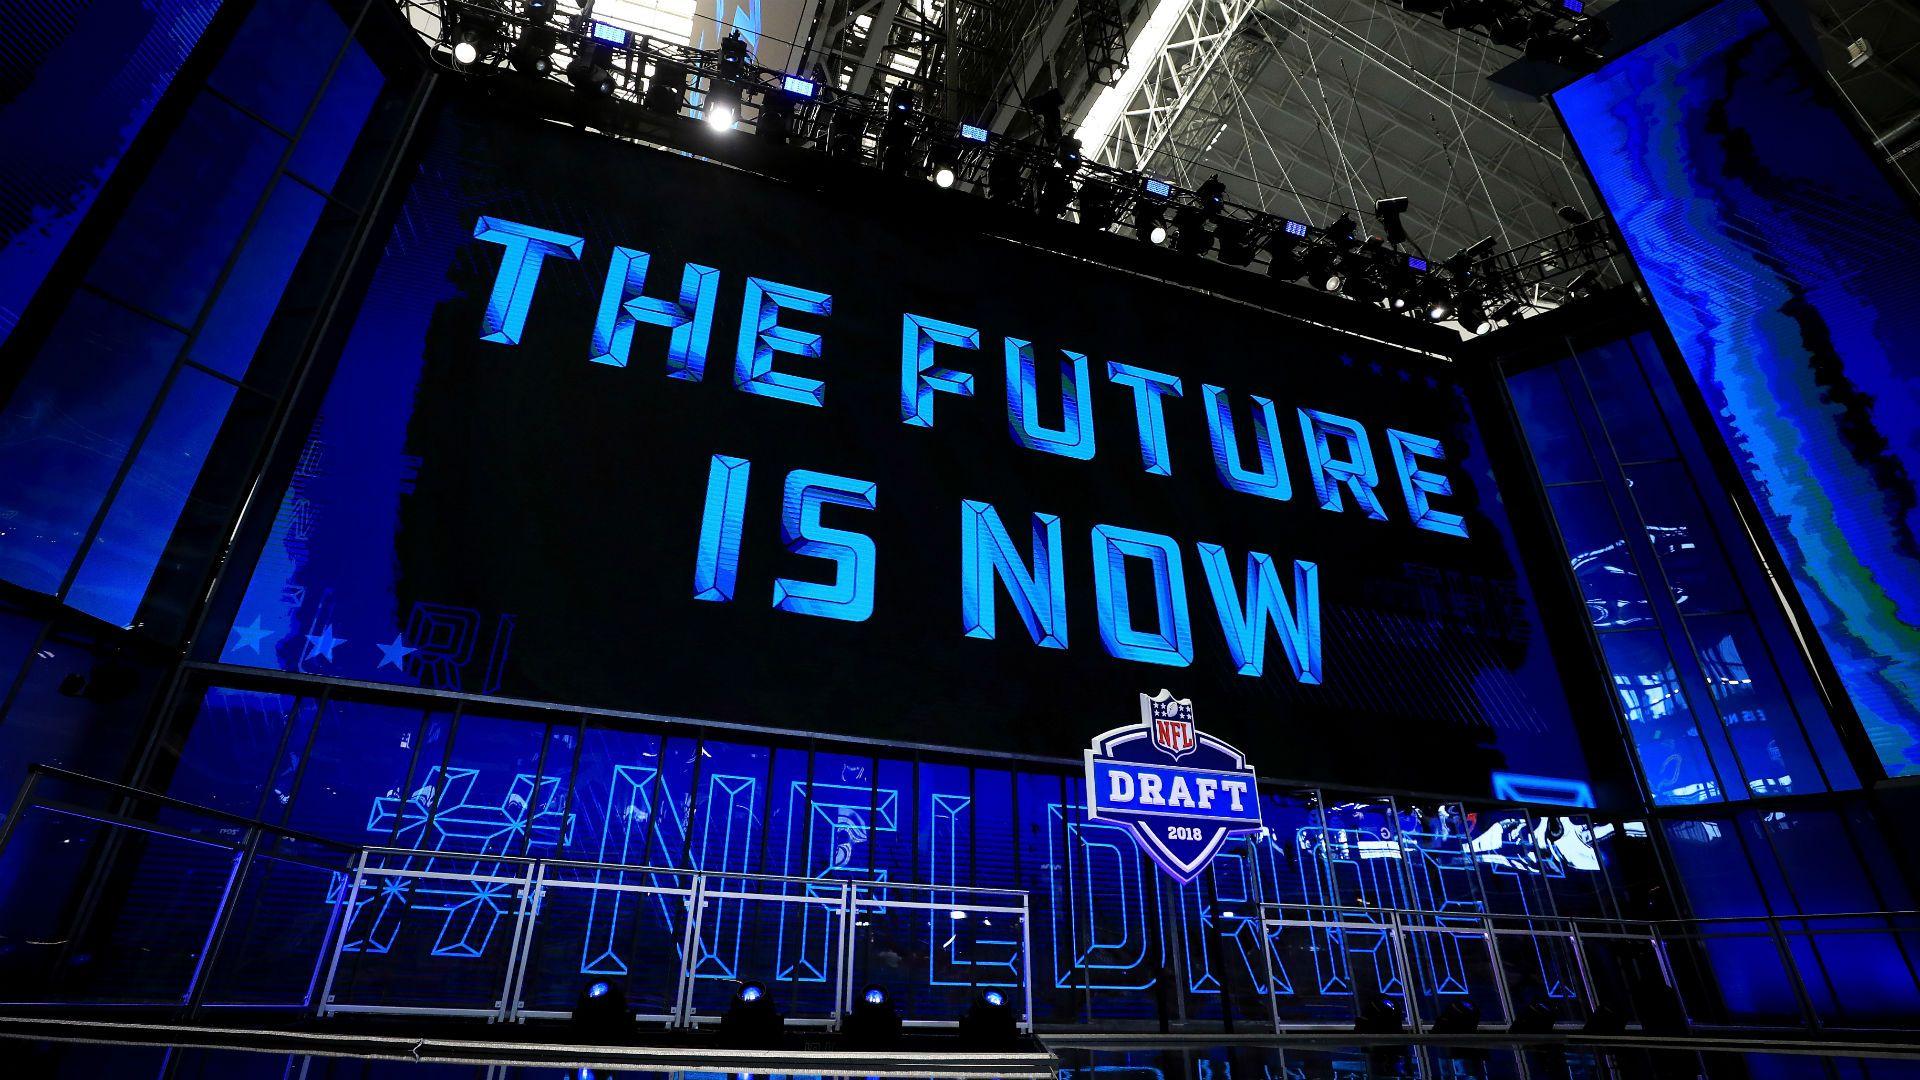 NFL Draft order 2019 Full list of picks after Patriots